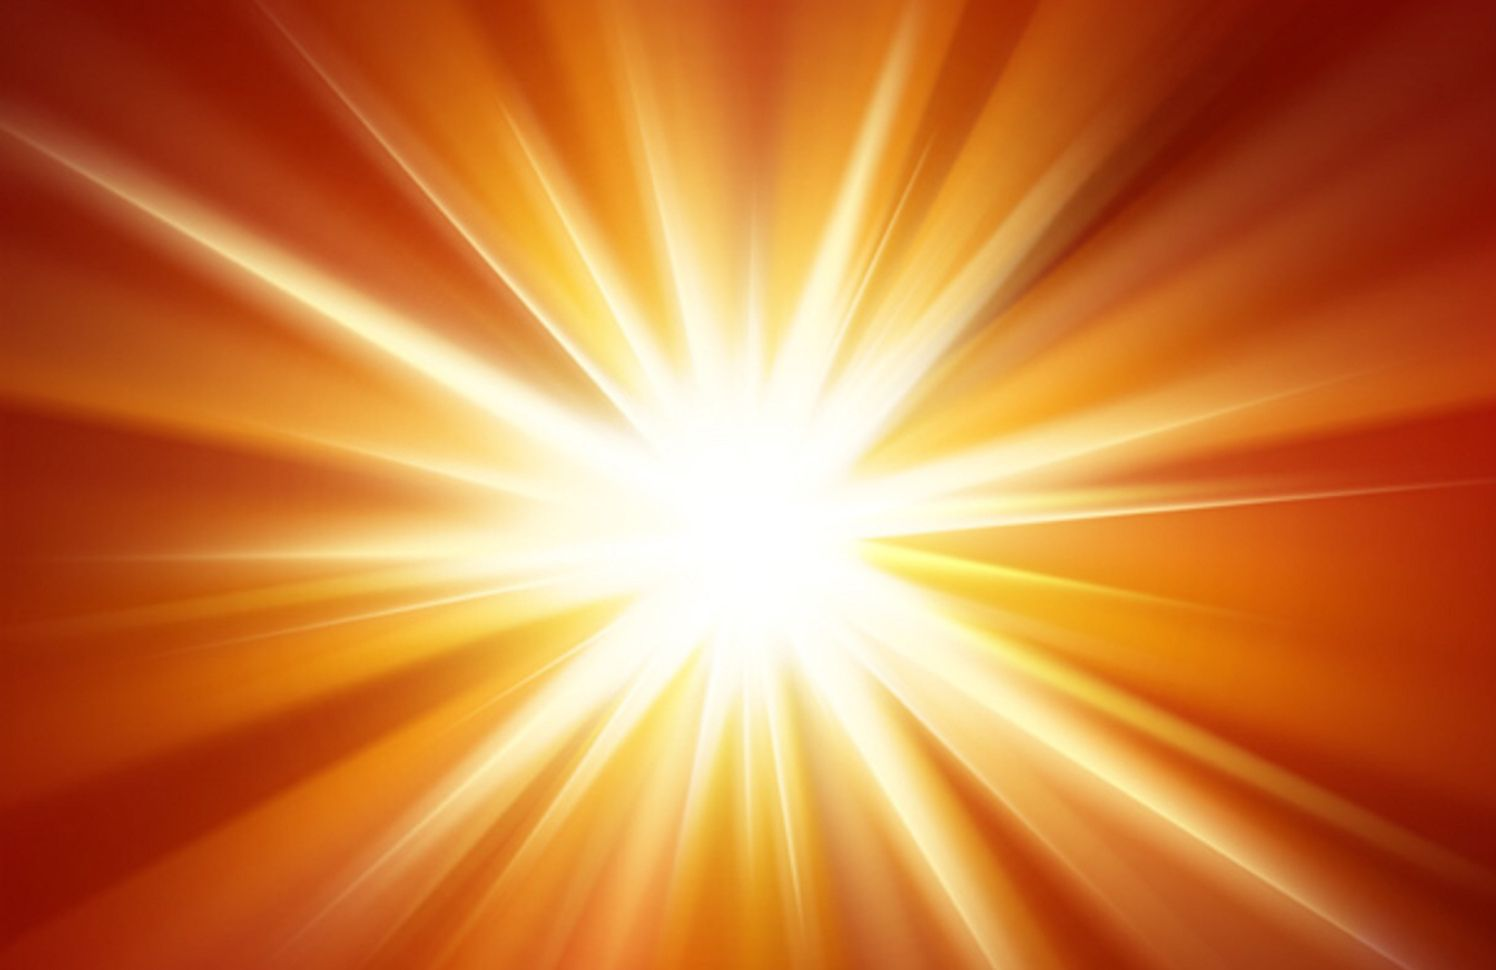 I Am The Light Divine Light Light Of Life Golden Lights